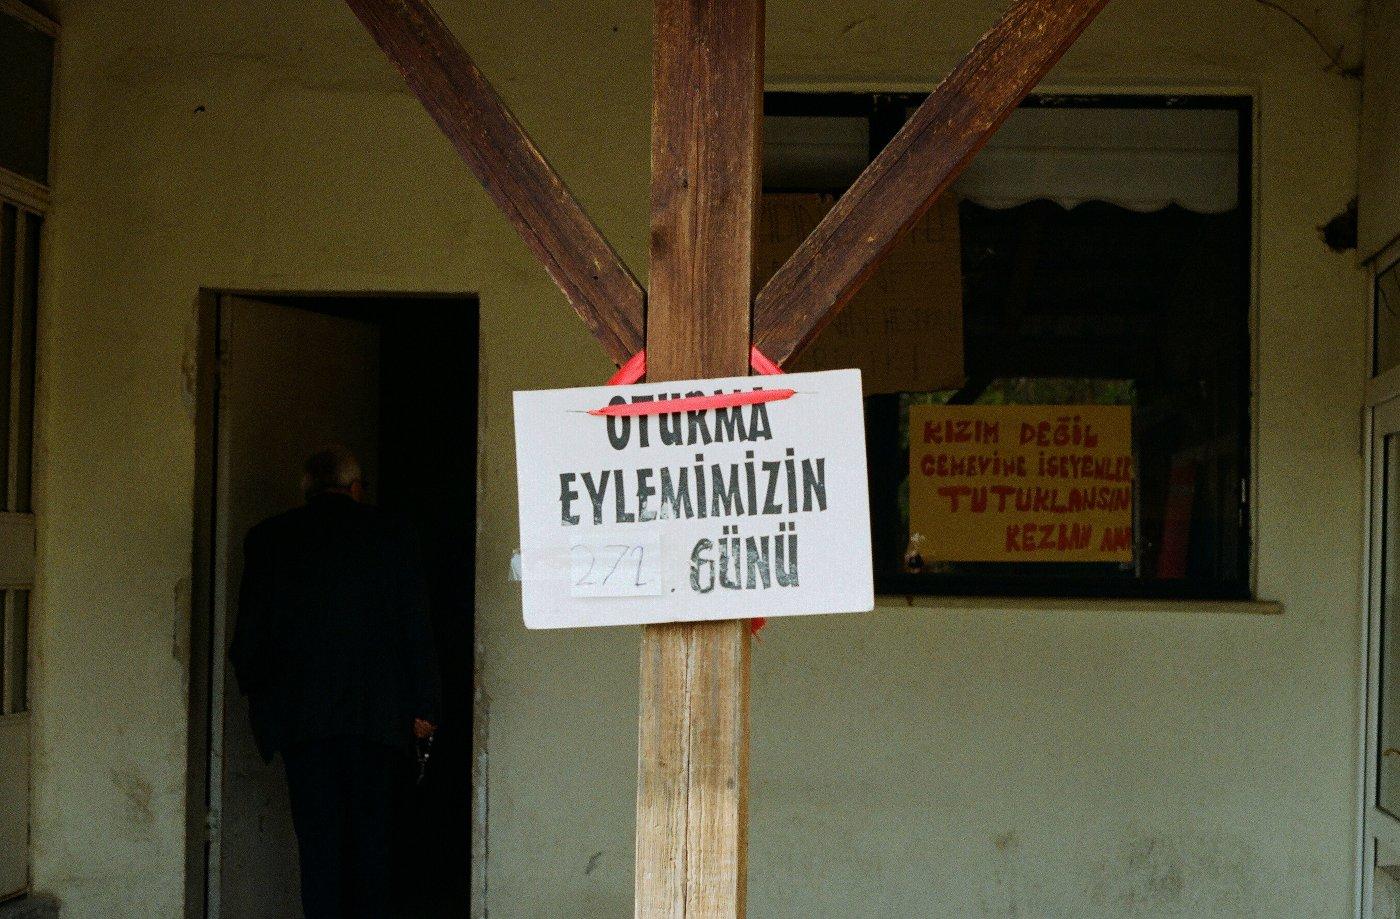 Un cartello indica i giorni di detenzione di Zeynep Yıldırım - foto di Francesco Brusa